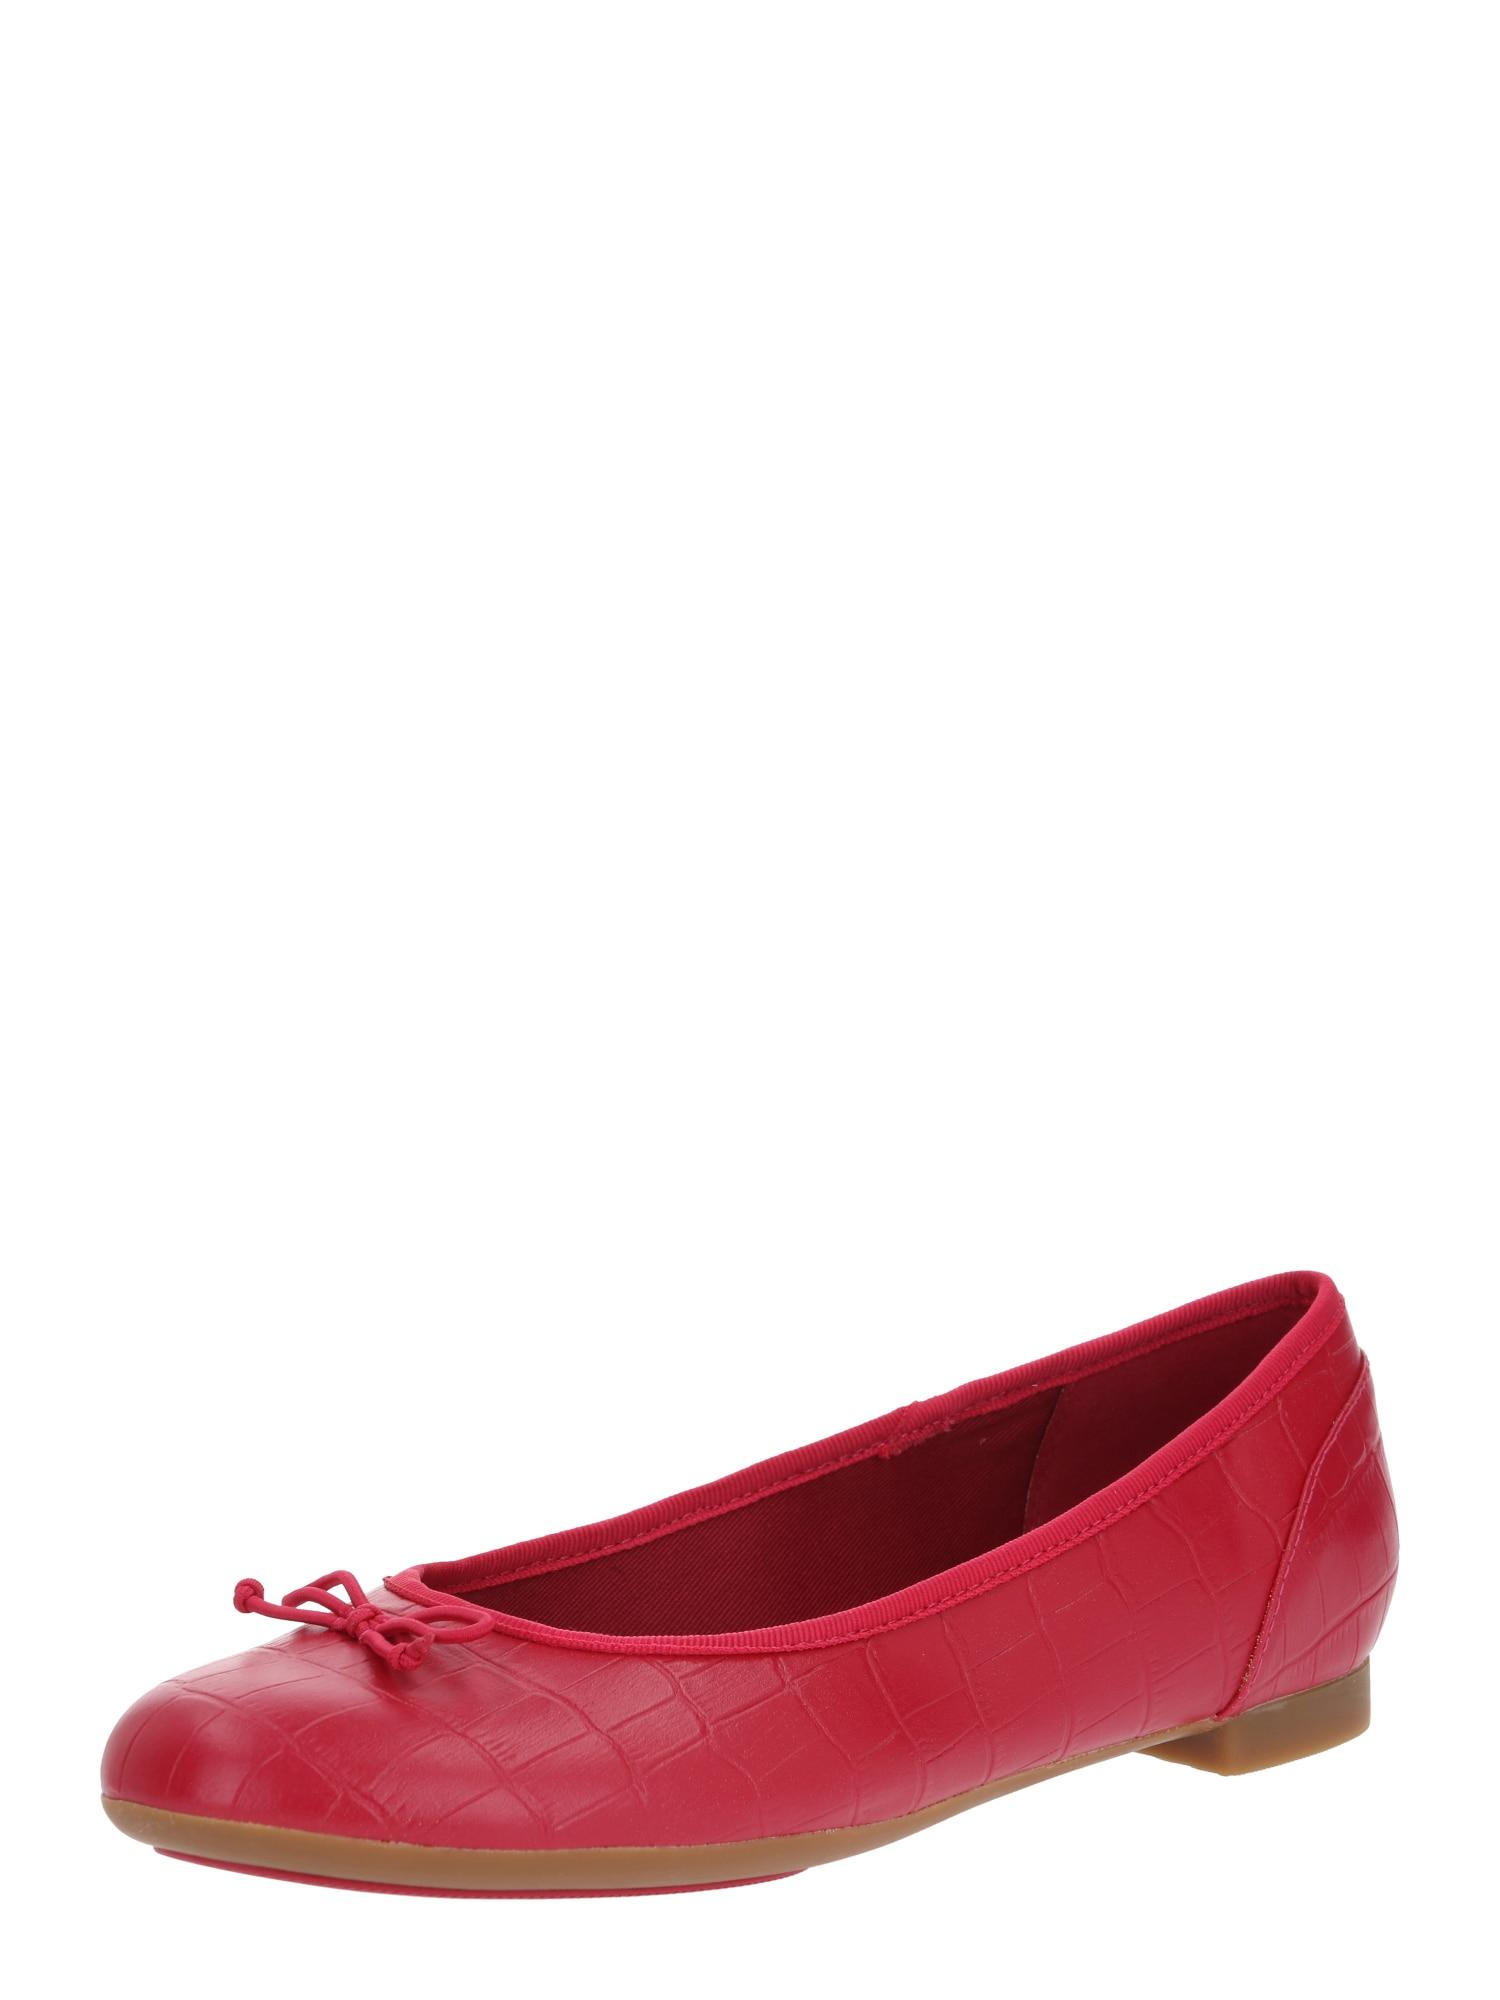 CLARKS Balerinos 'Couture bloom' fuchsijų spalva